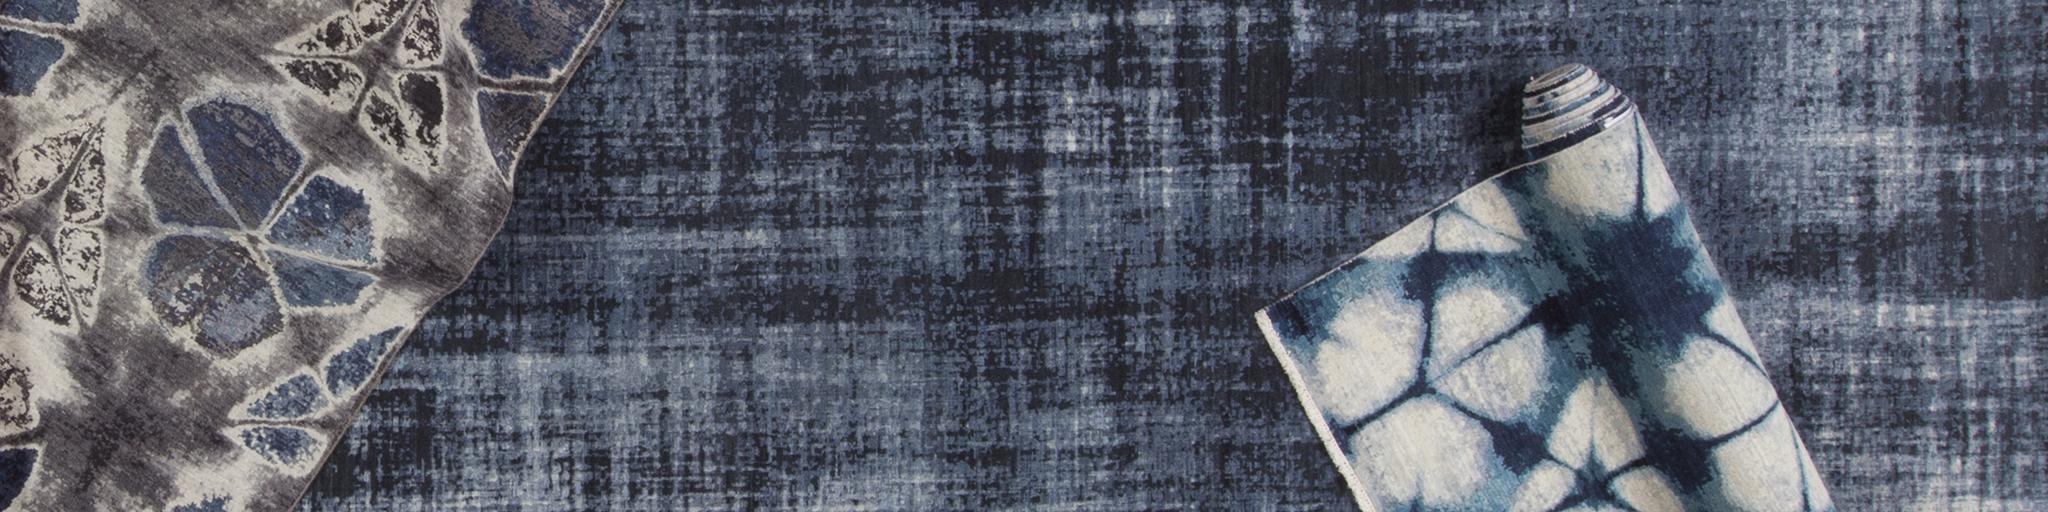 Shibori Style | An Exploration